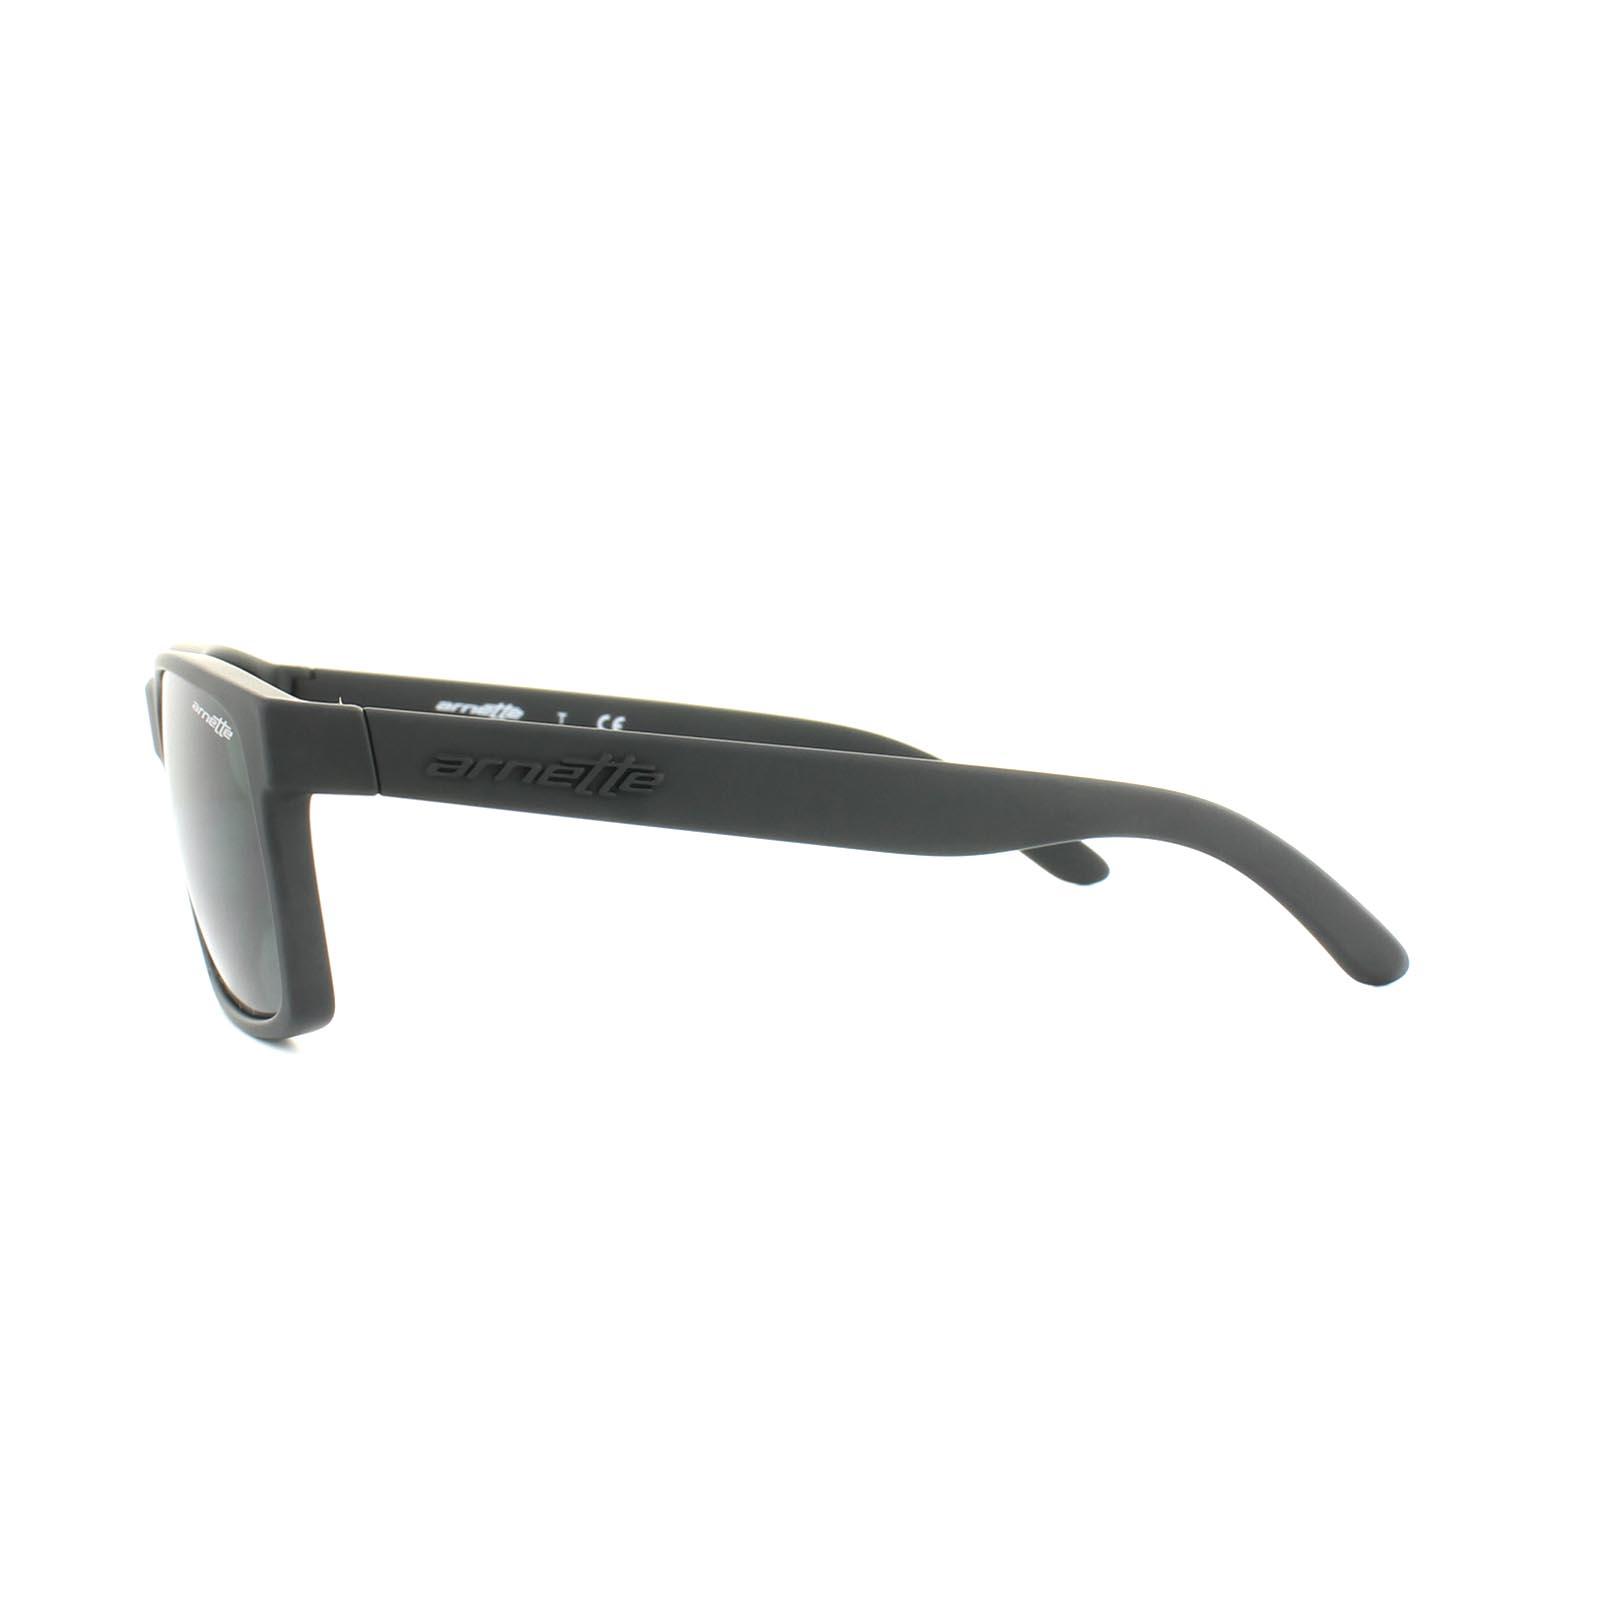 091090fa06 Sentinel Thumbnail 3. Sentinel Arnette Sunglasses Slickster 4185 447 87  Black Rubber Grey